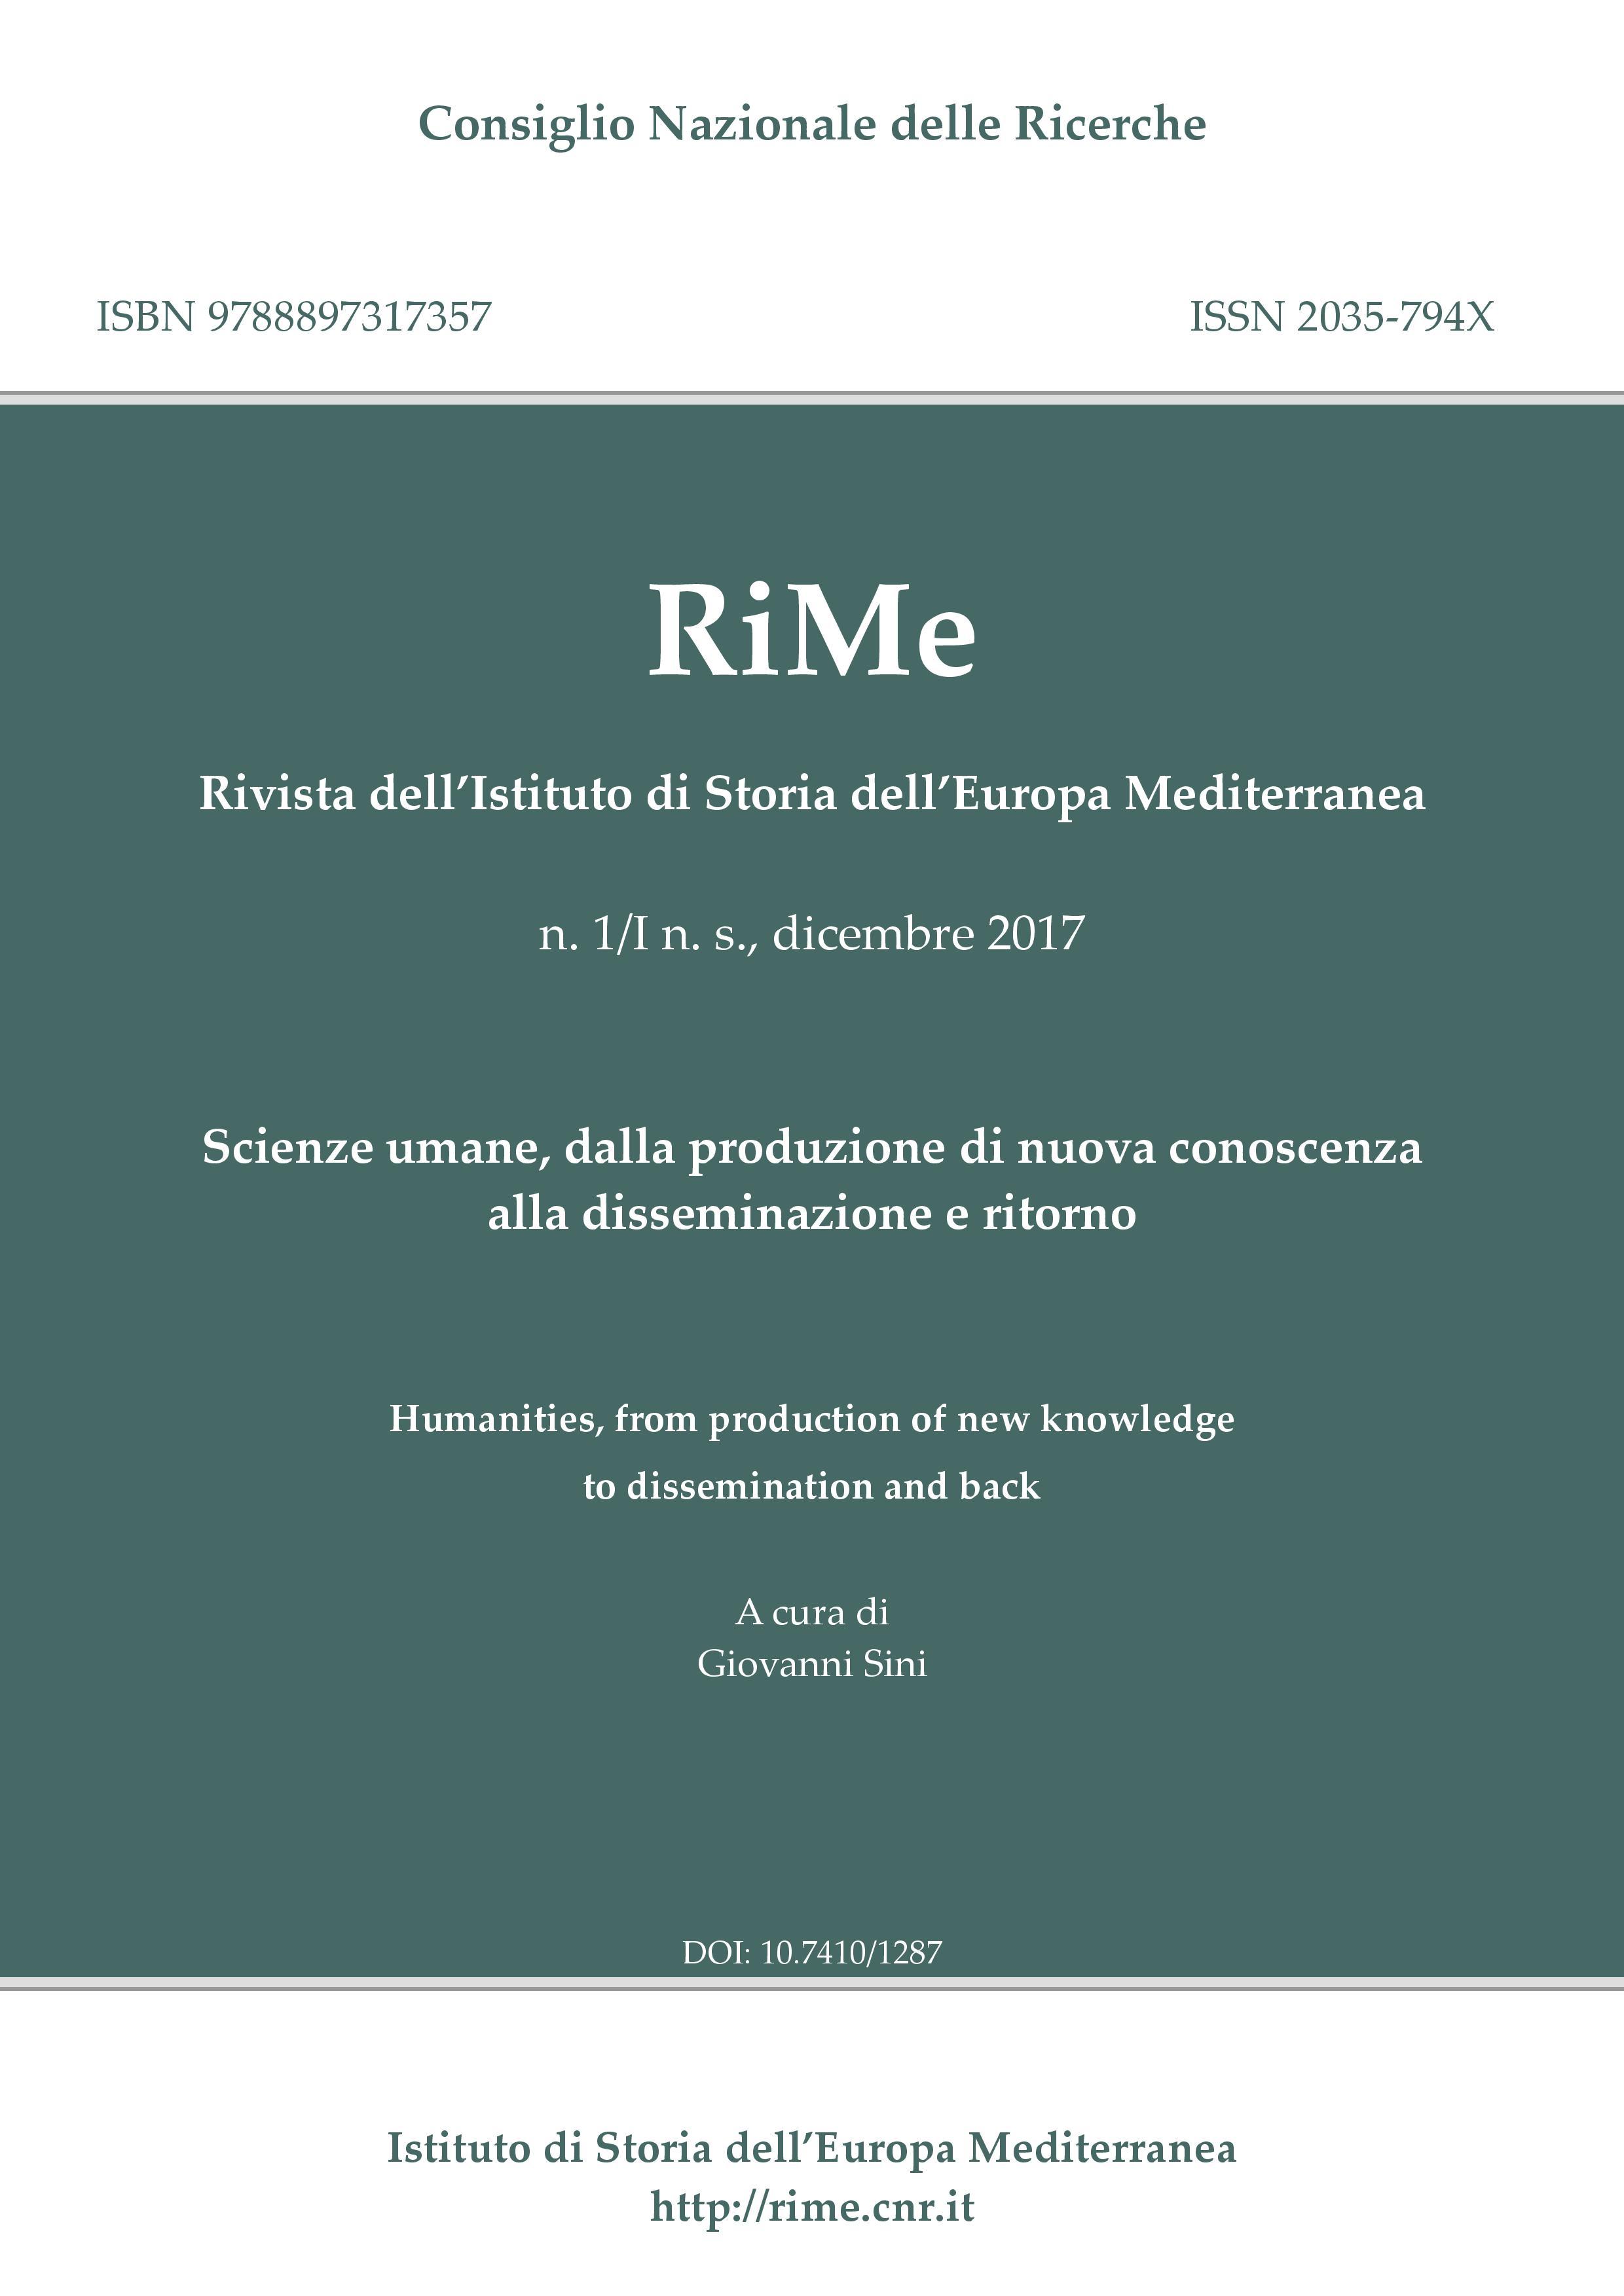 Vol. 1/I n.s. (December 2017) cover